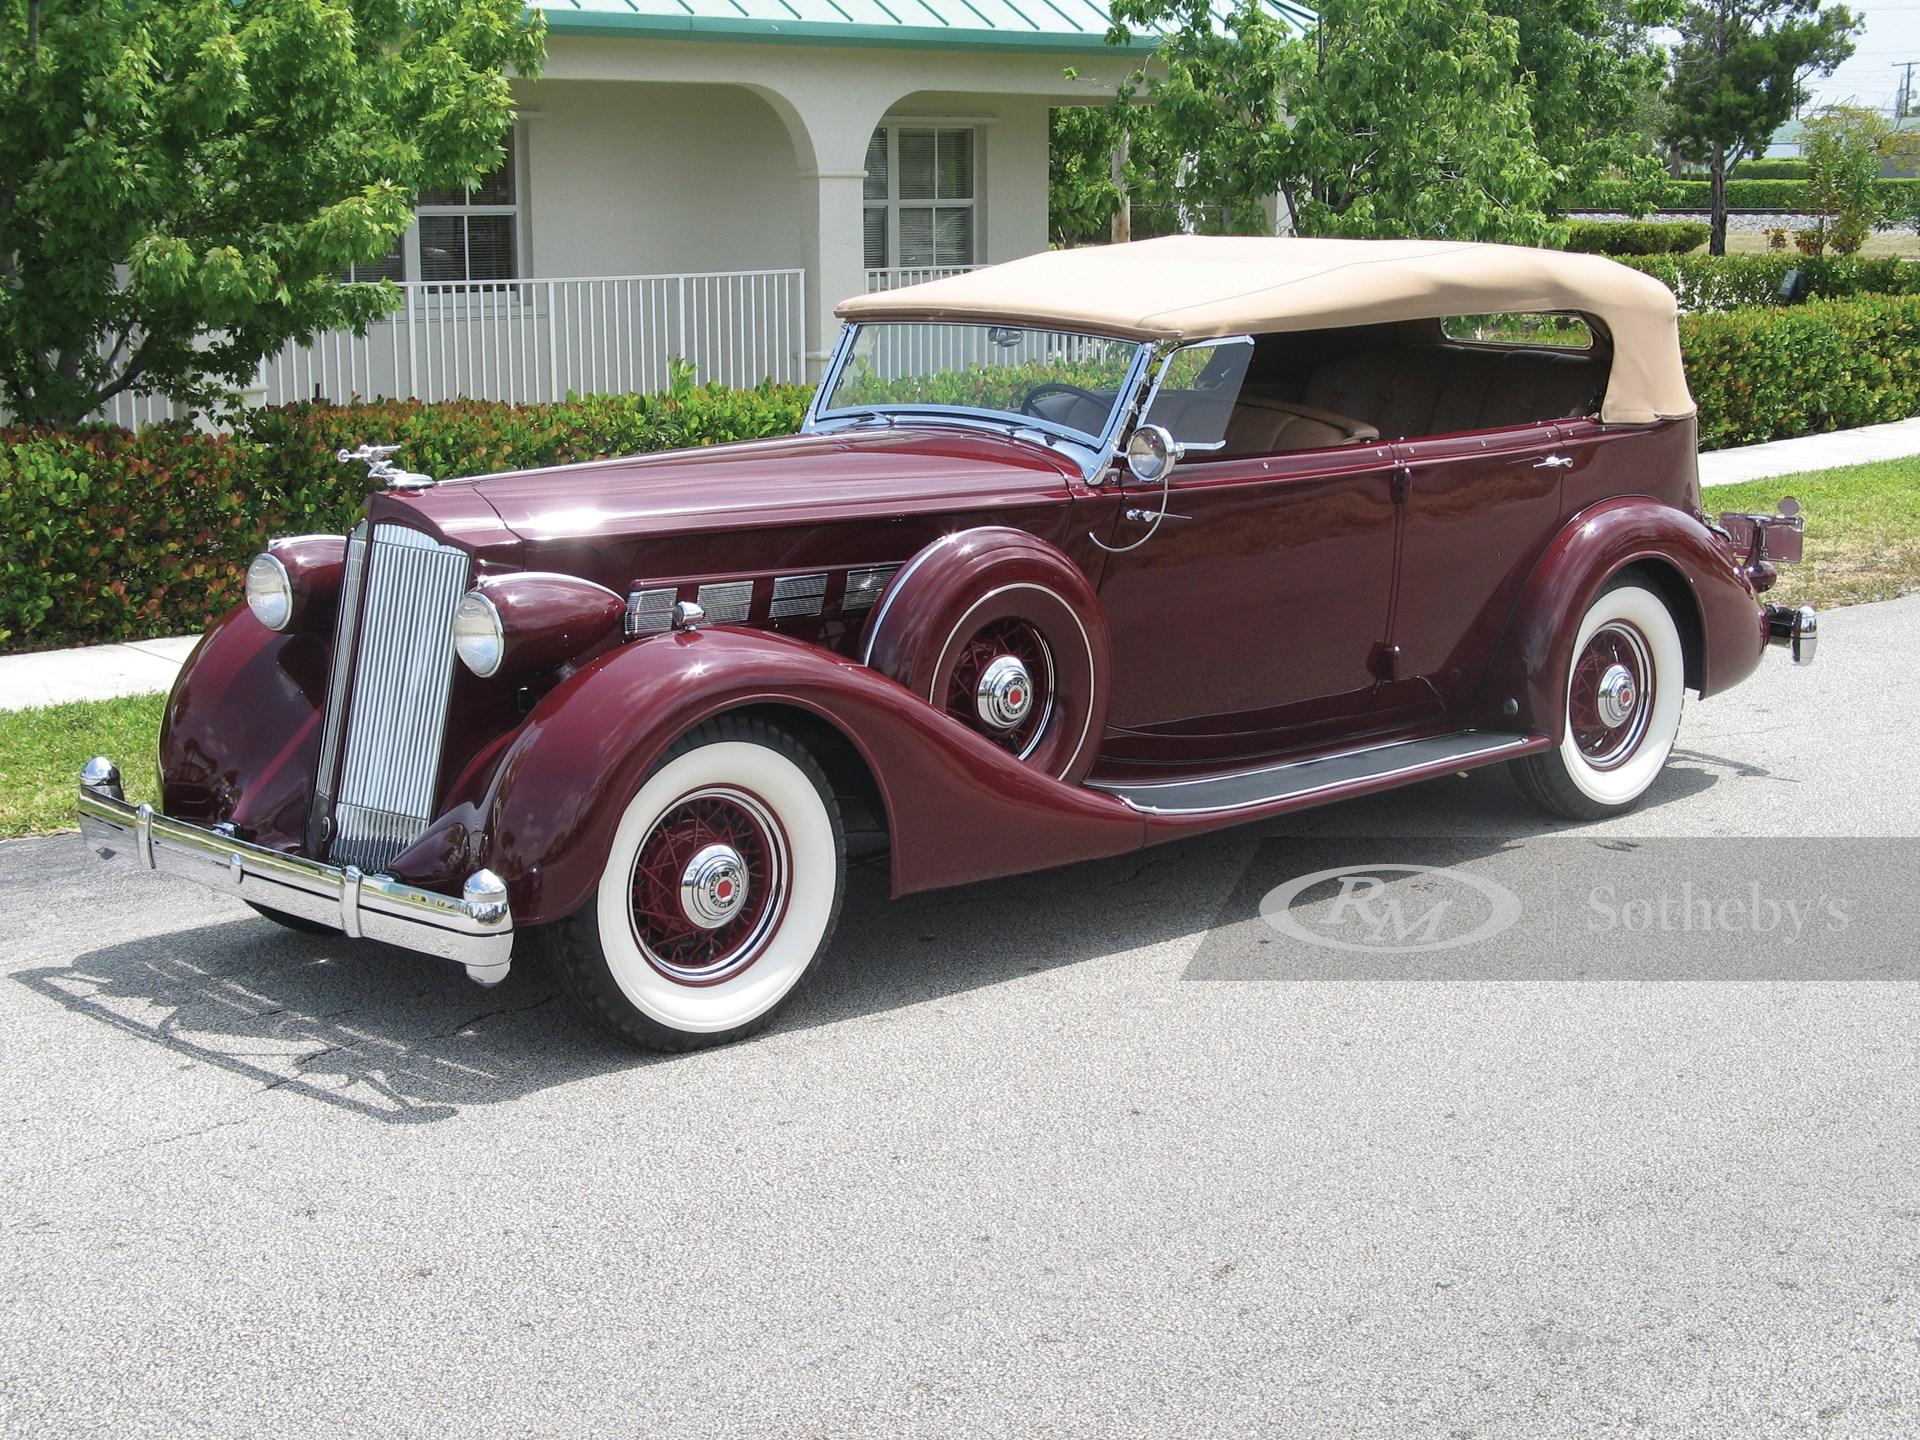 1936 Packard Super Eight Five-Passenger Phaeton